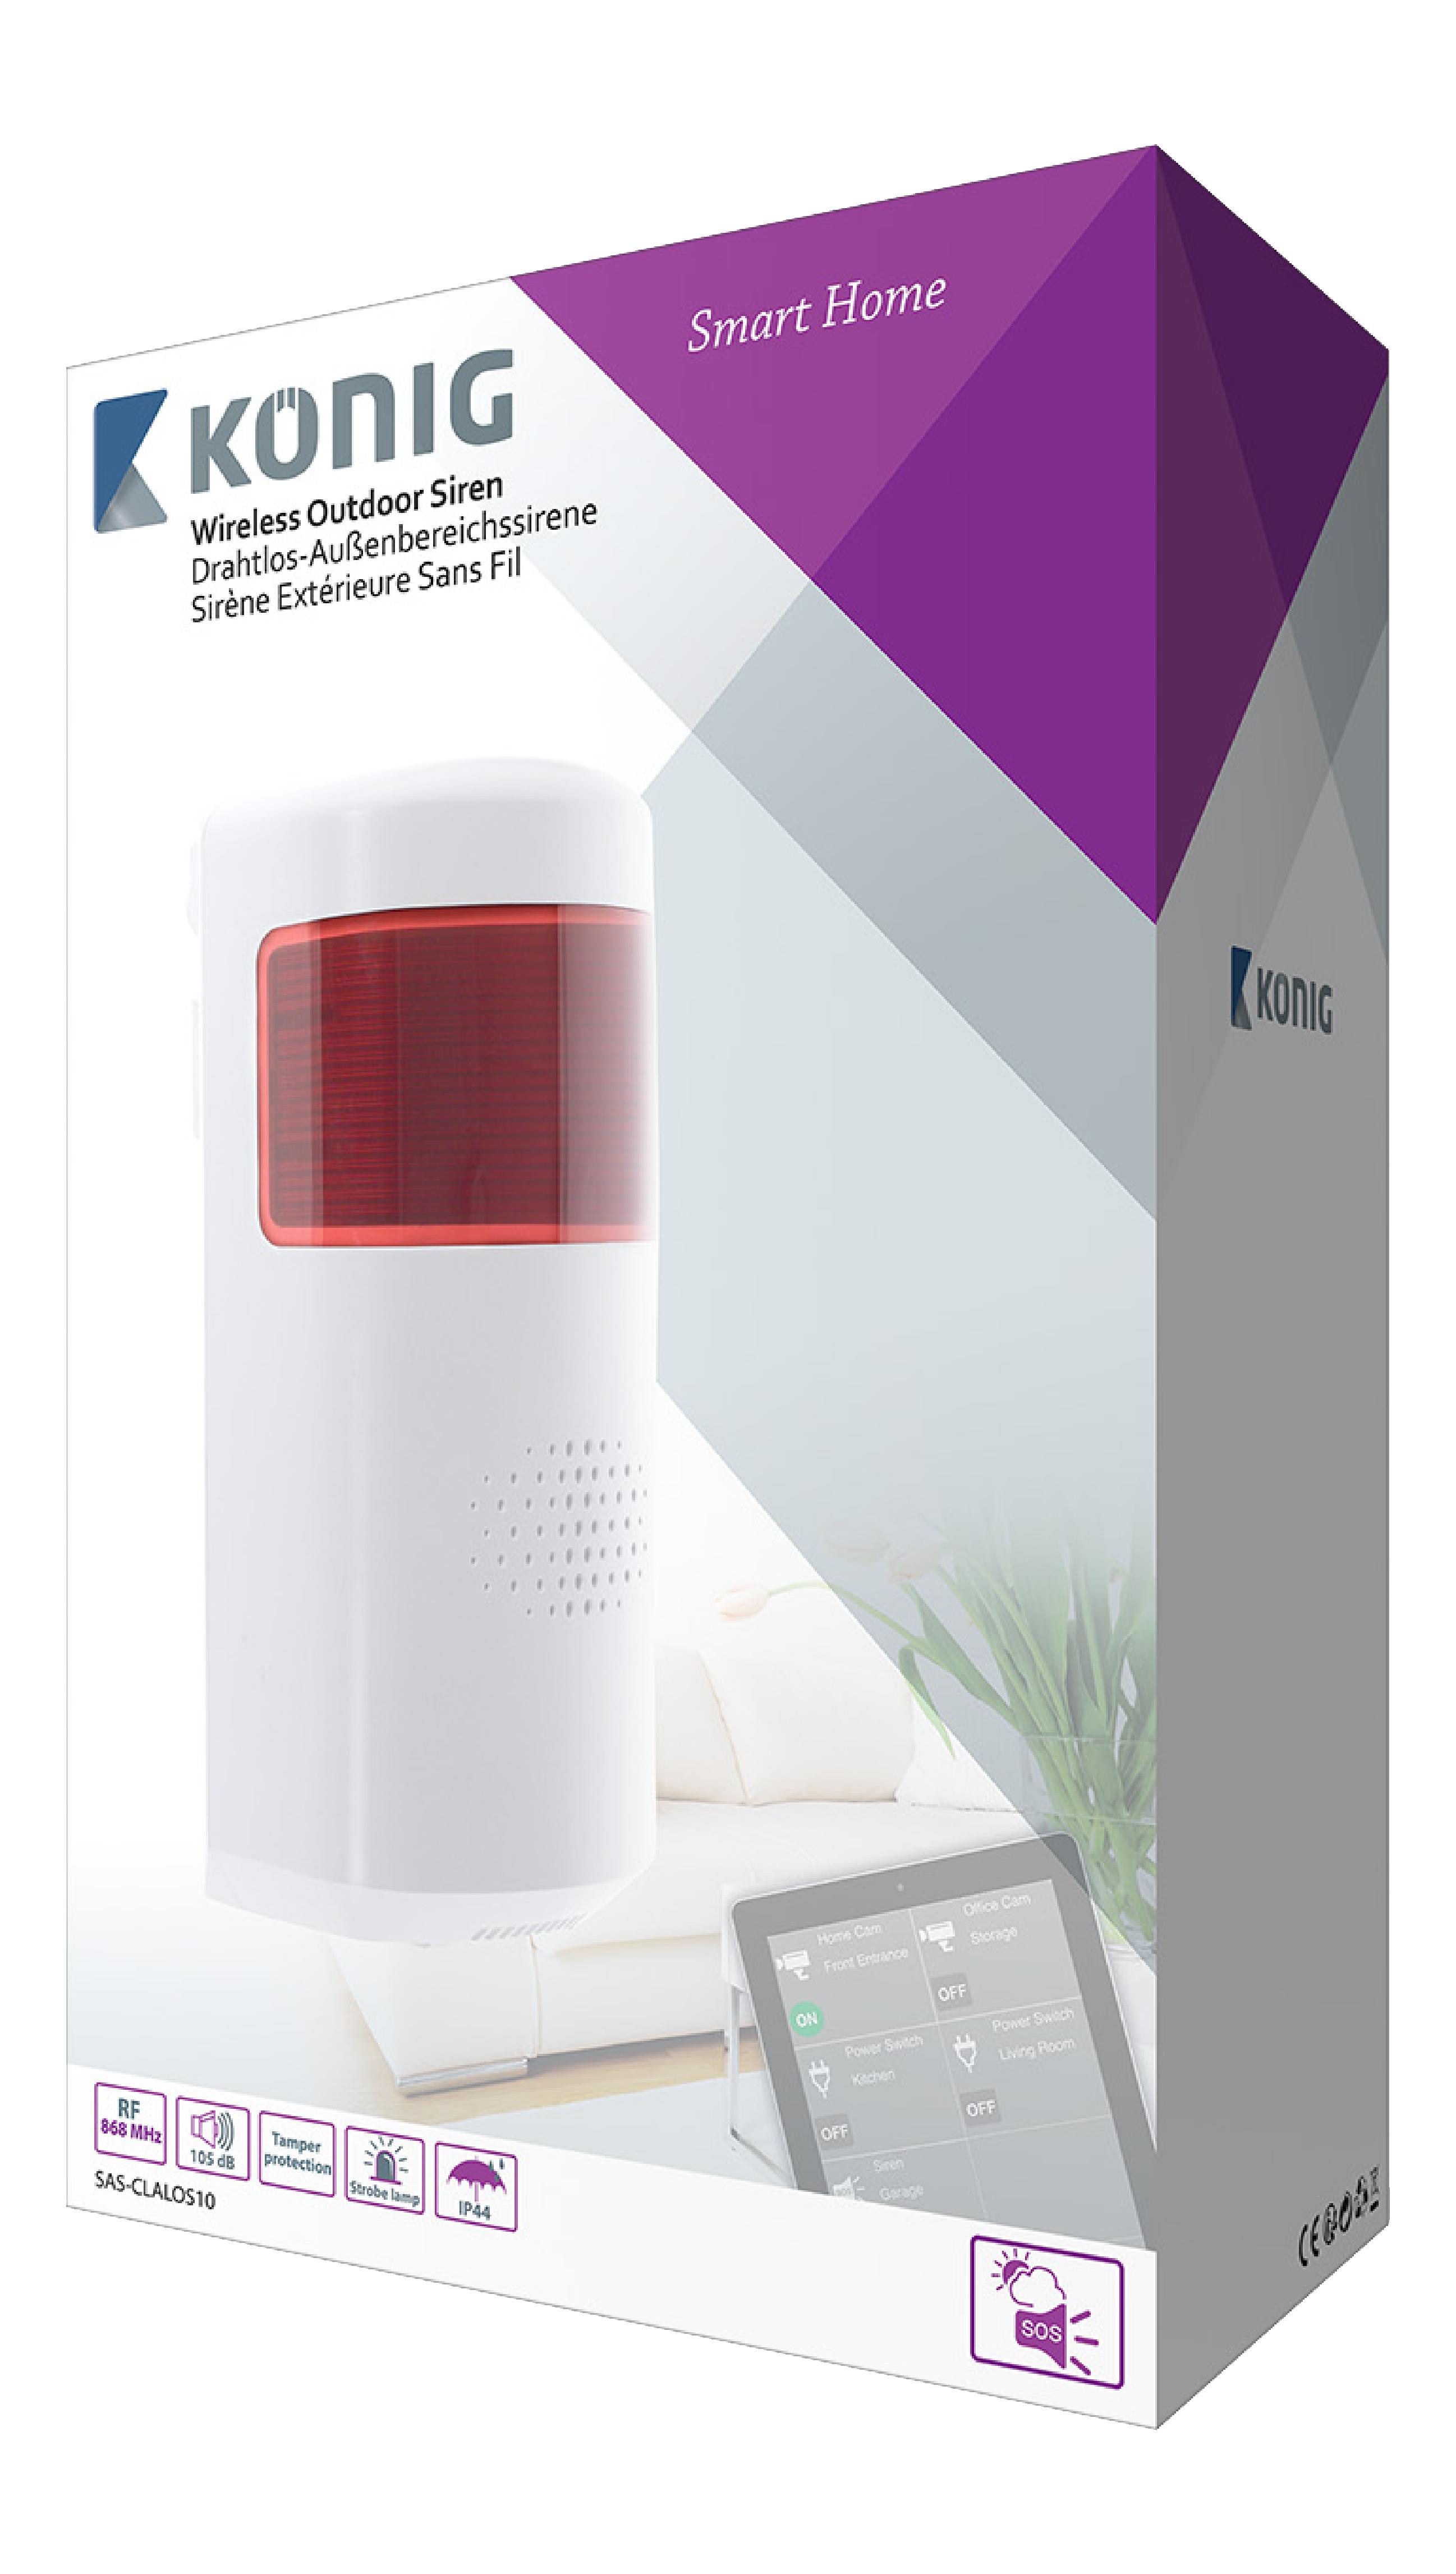 sas clalos10 k nig smart siren outdoor 868 mhz electronic. Black Bedroom Furniture Sets. Home Design Ideas